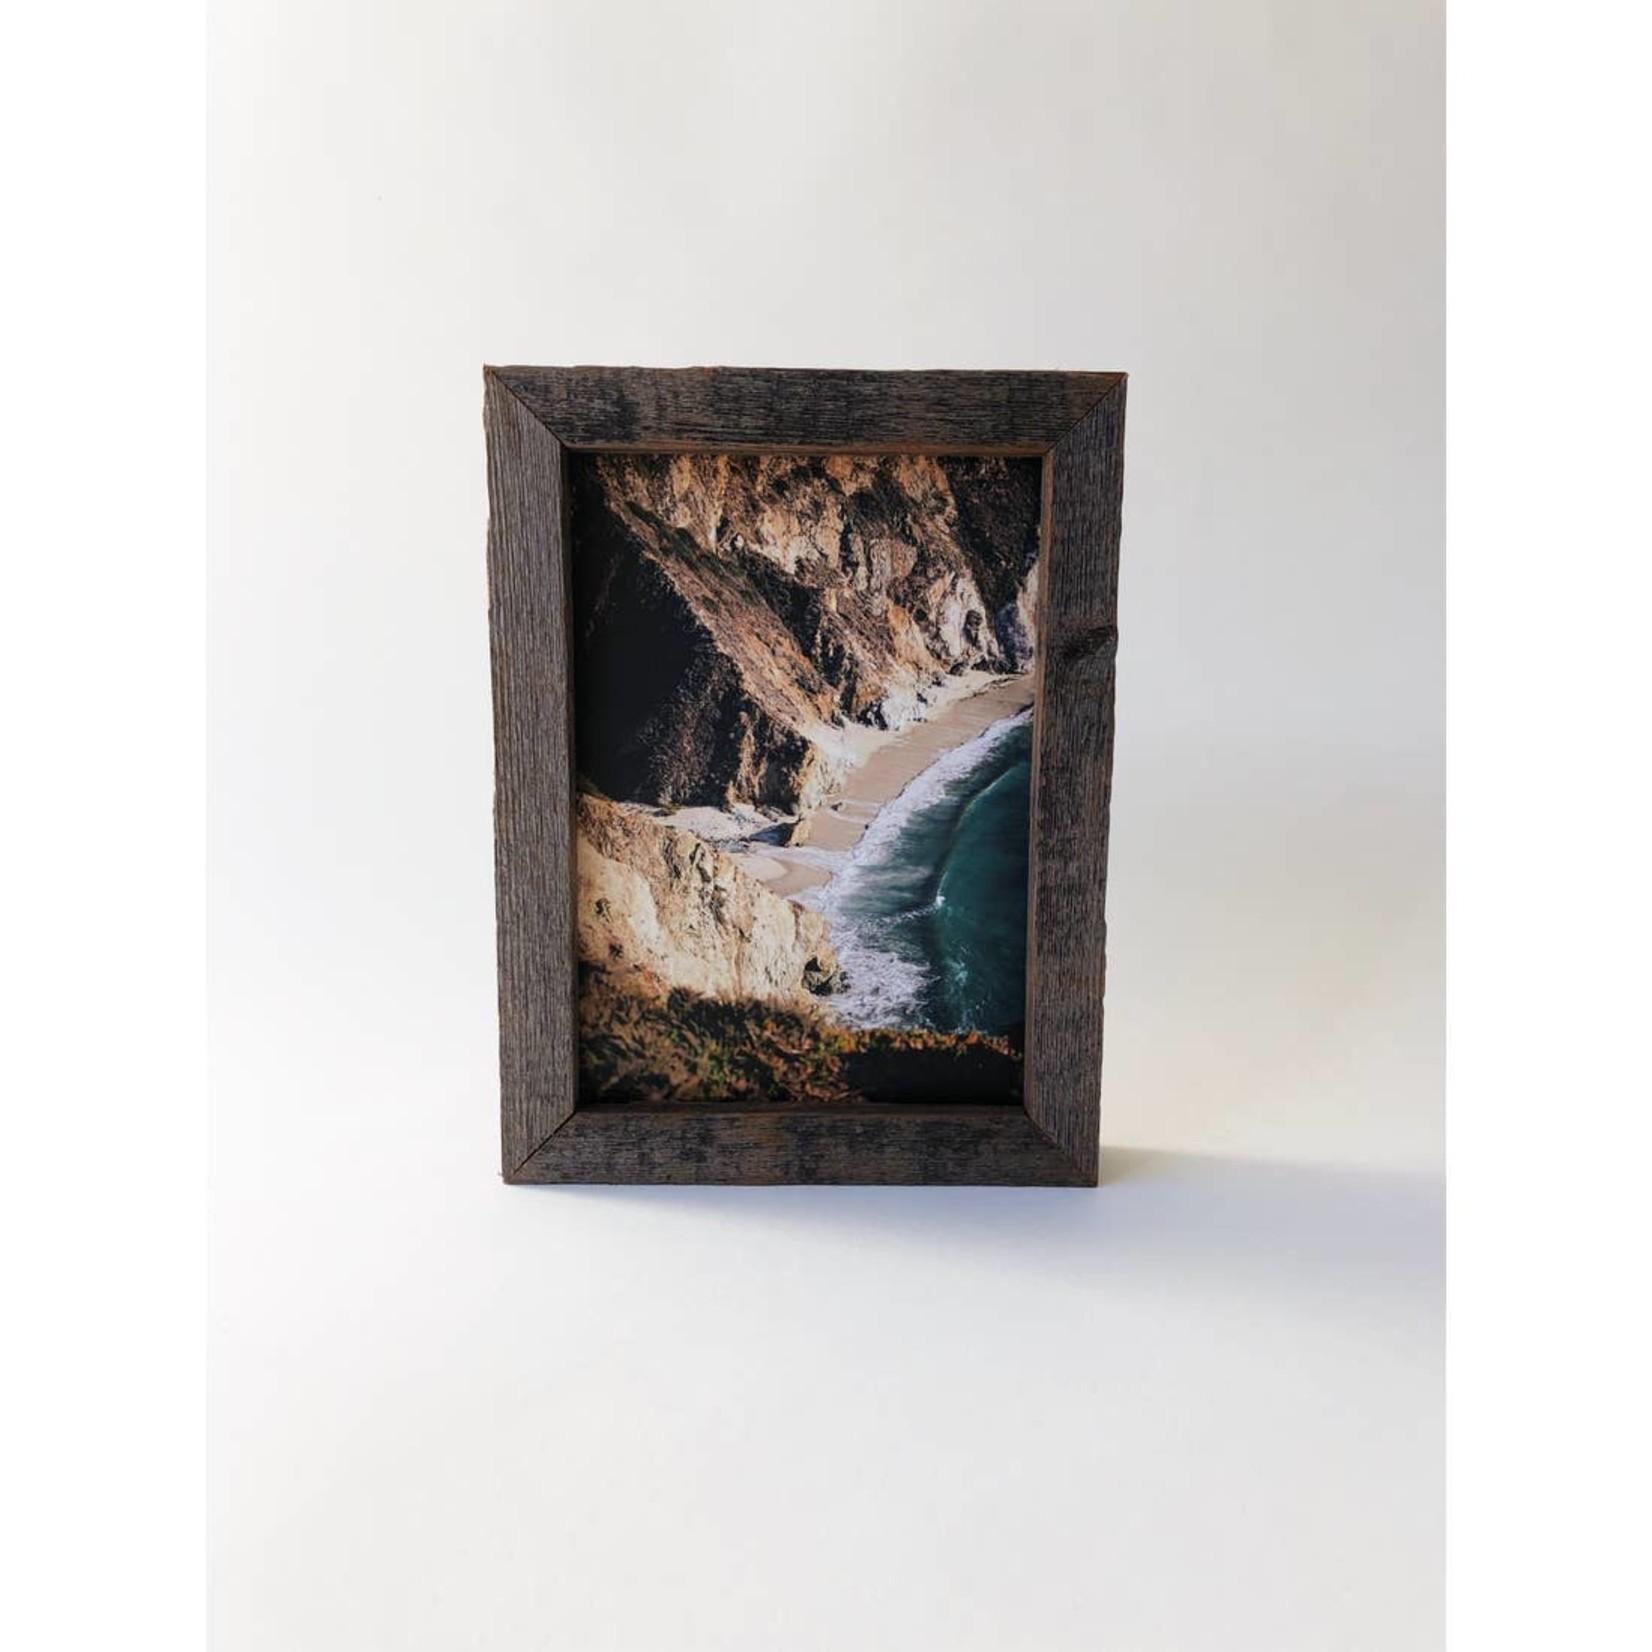 Alibi Interiors Alibi Reclaimed Wood Gallery Frame 5x7